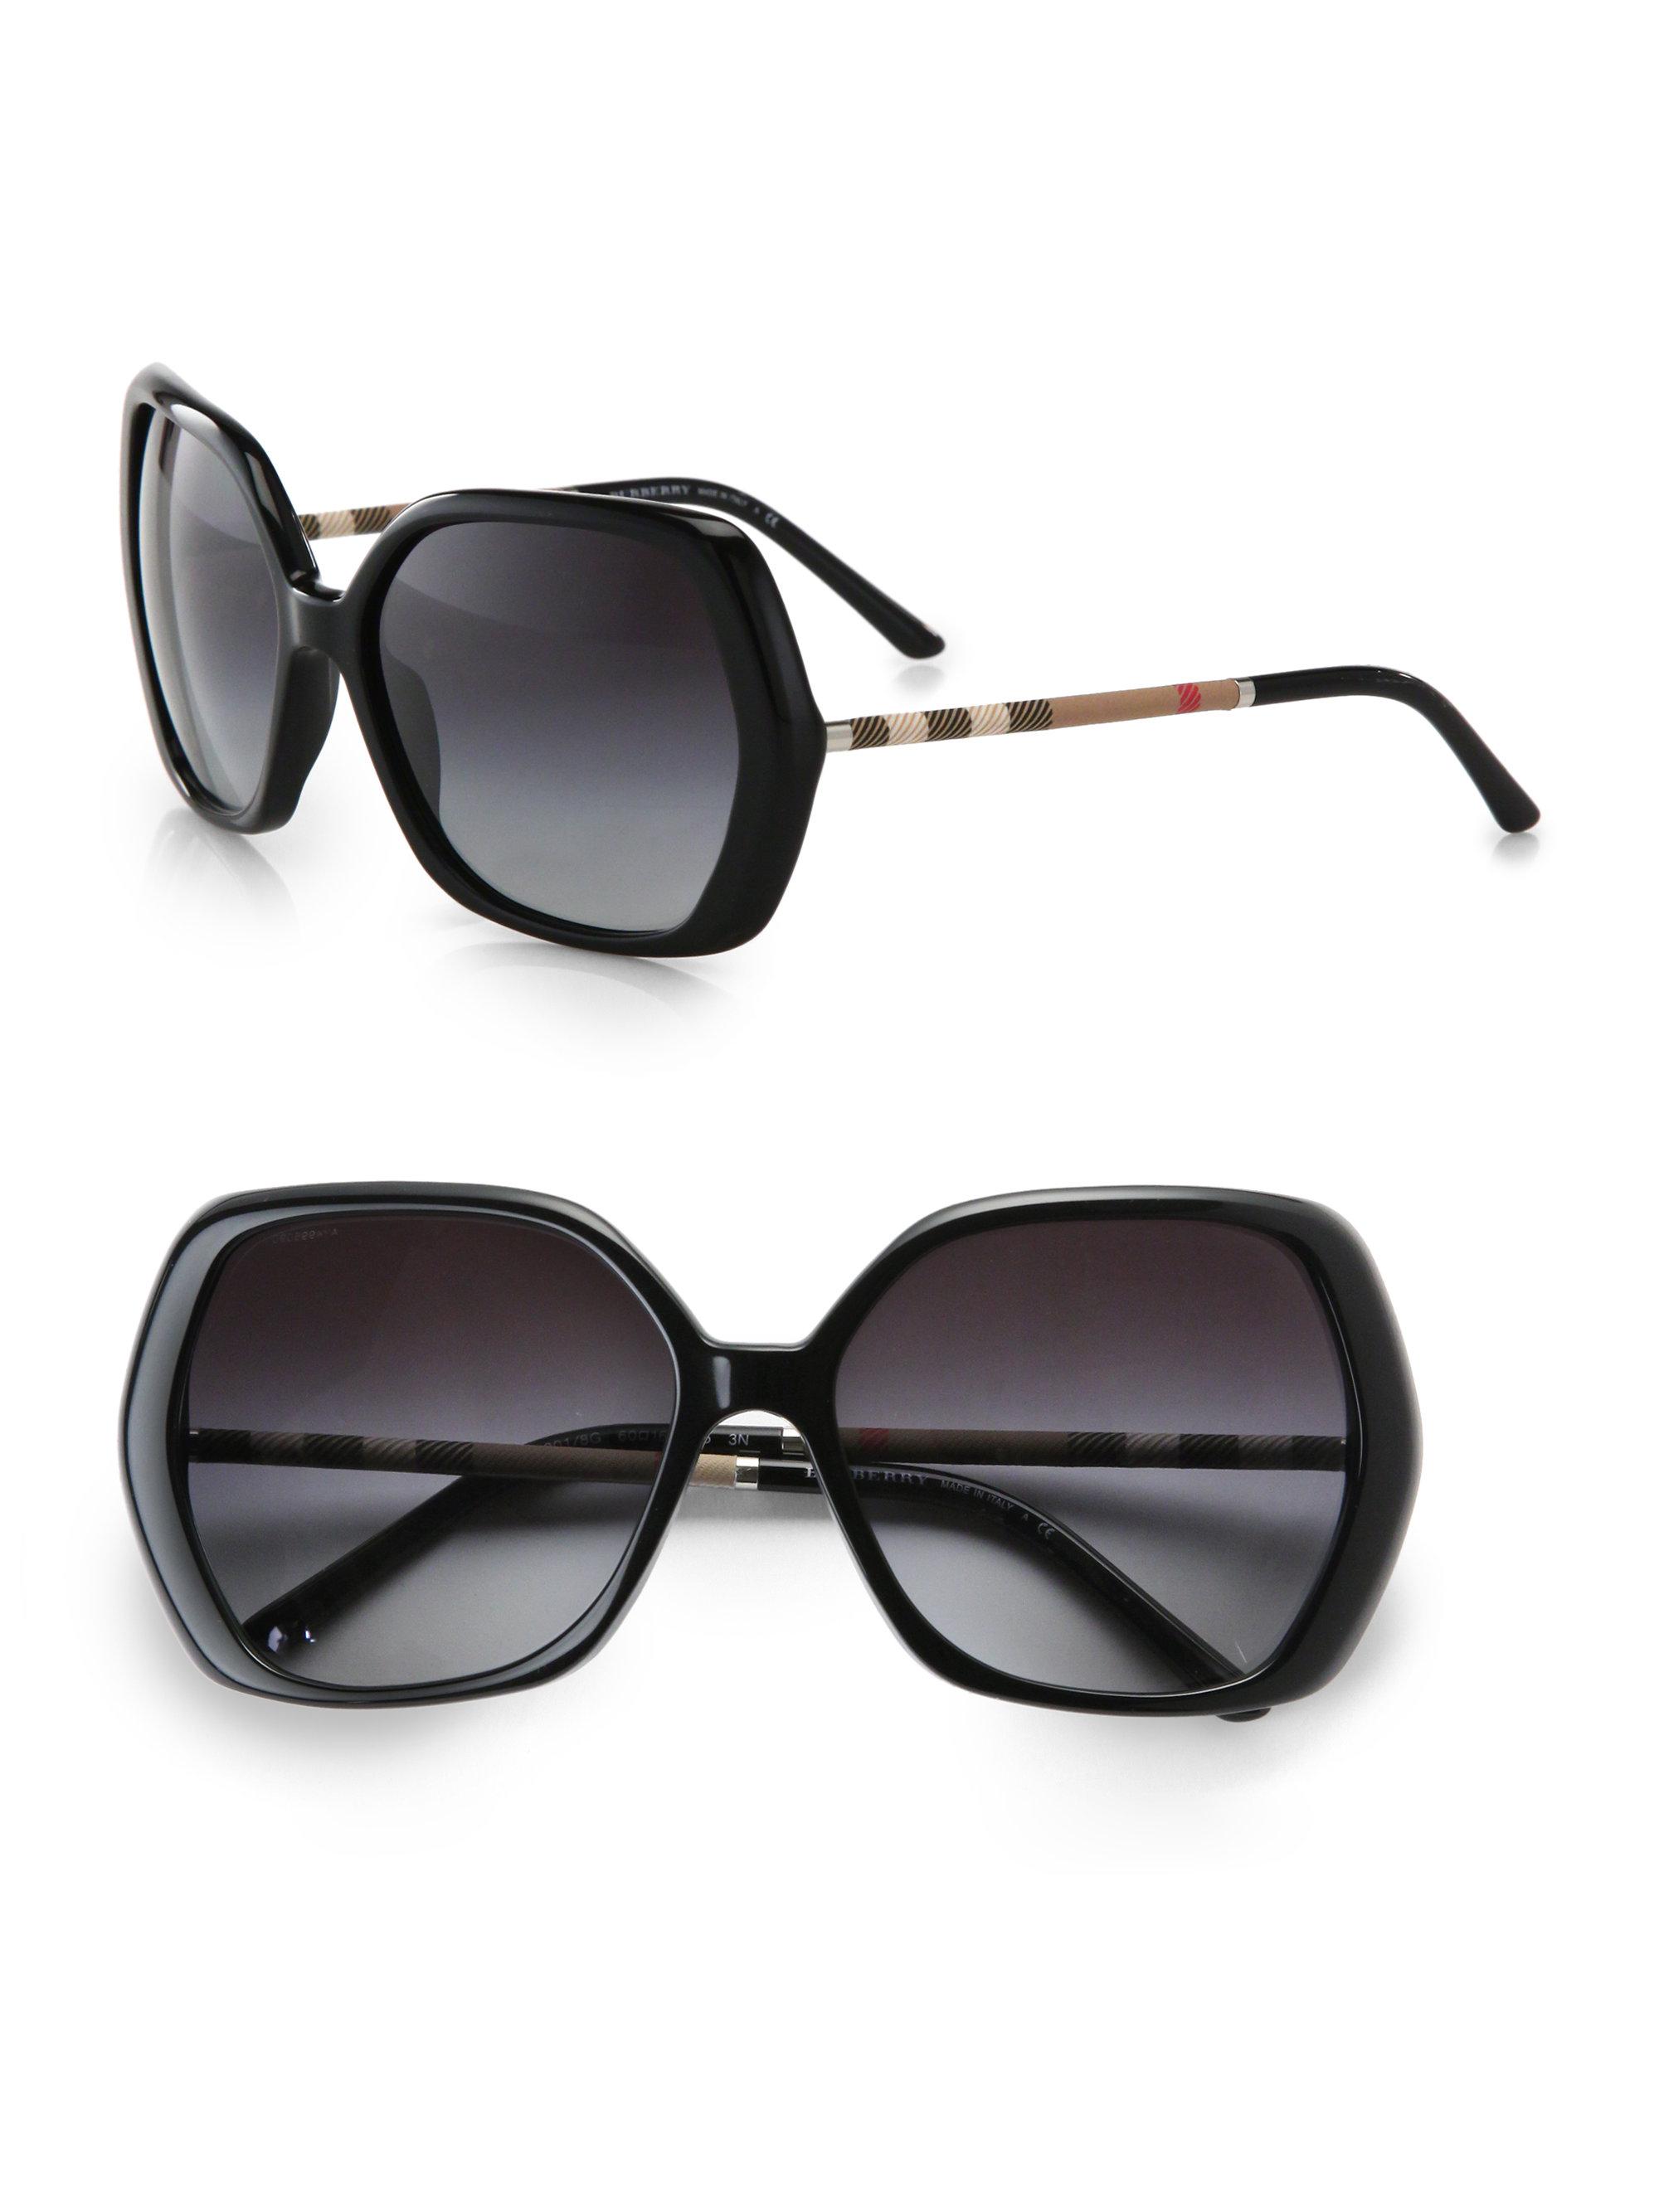 e048930758b Lyst burberry glam check butterfly sunglasses in brown jpg 2000x2667 Burberry  black plastic eye frames